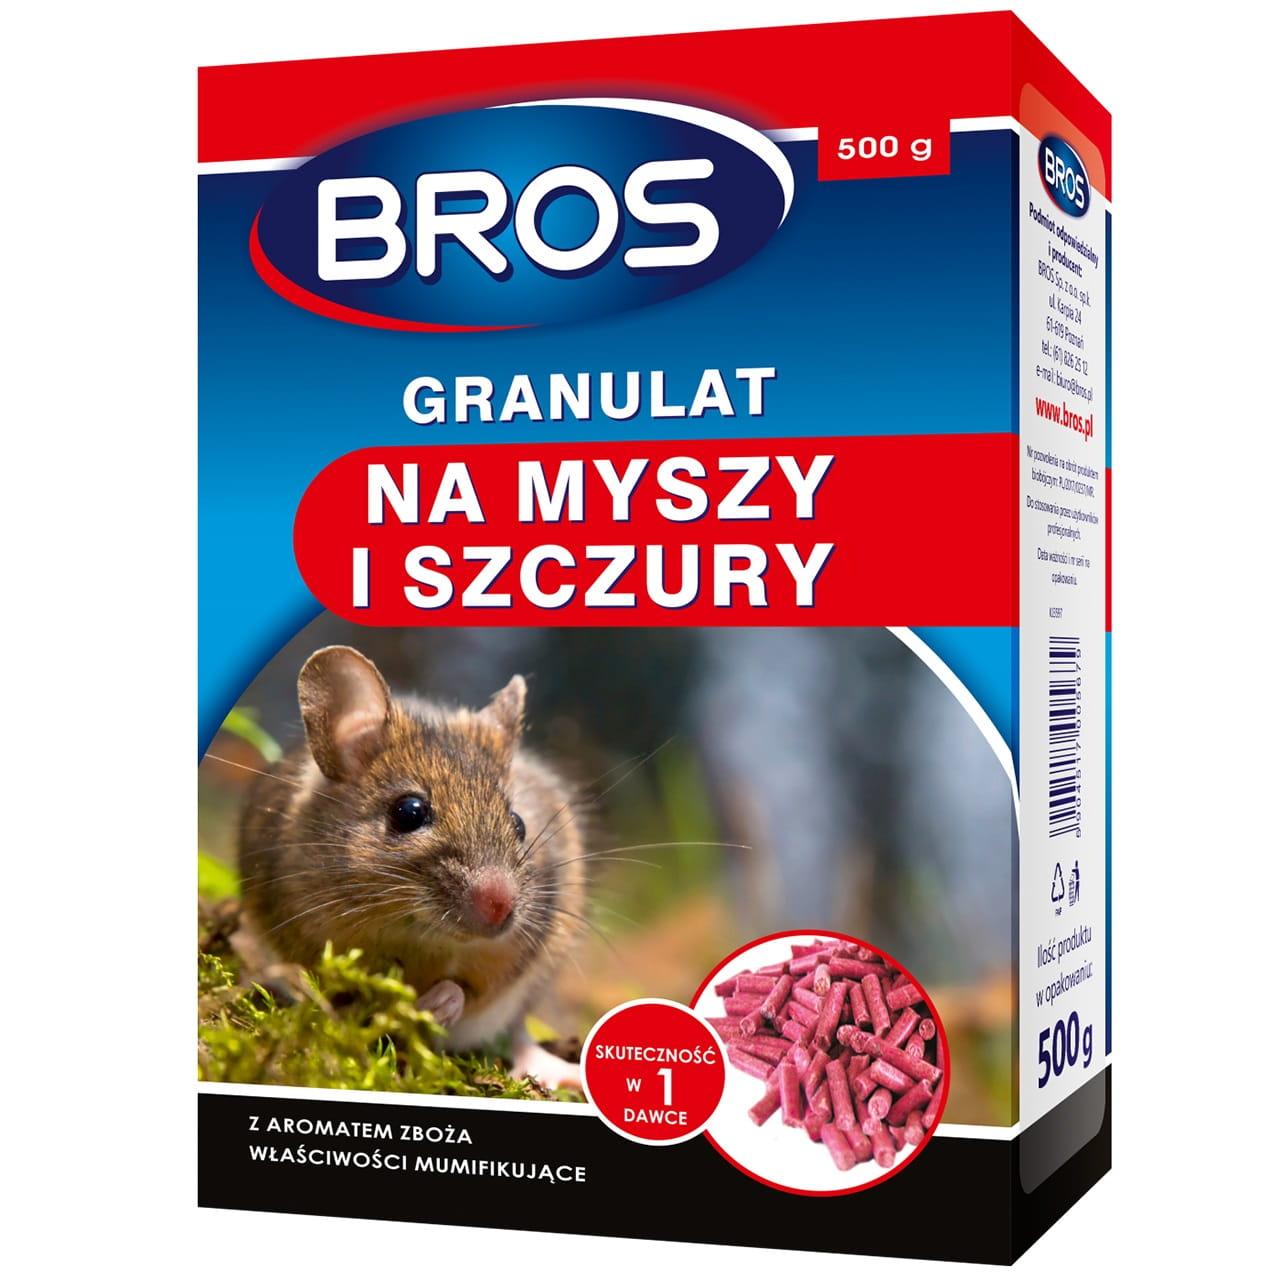 BROS granulat na myszy i szczury